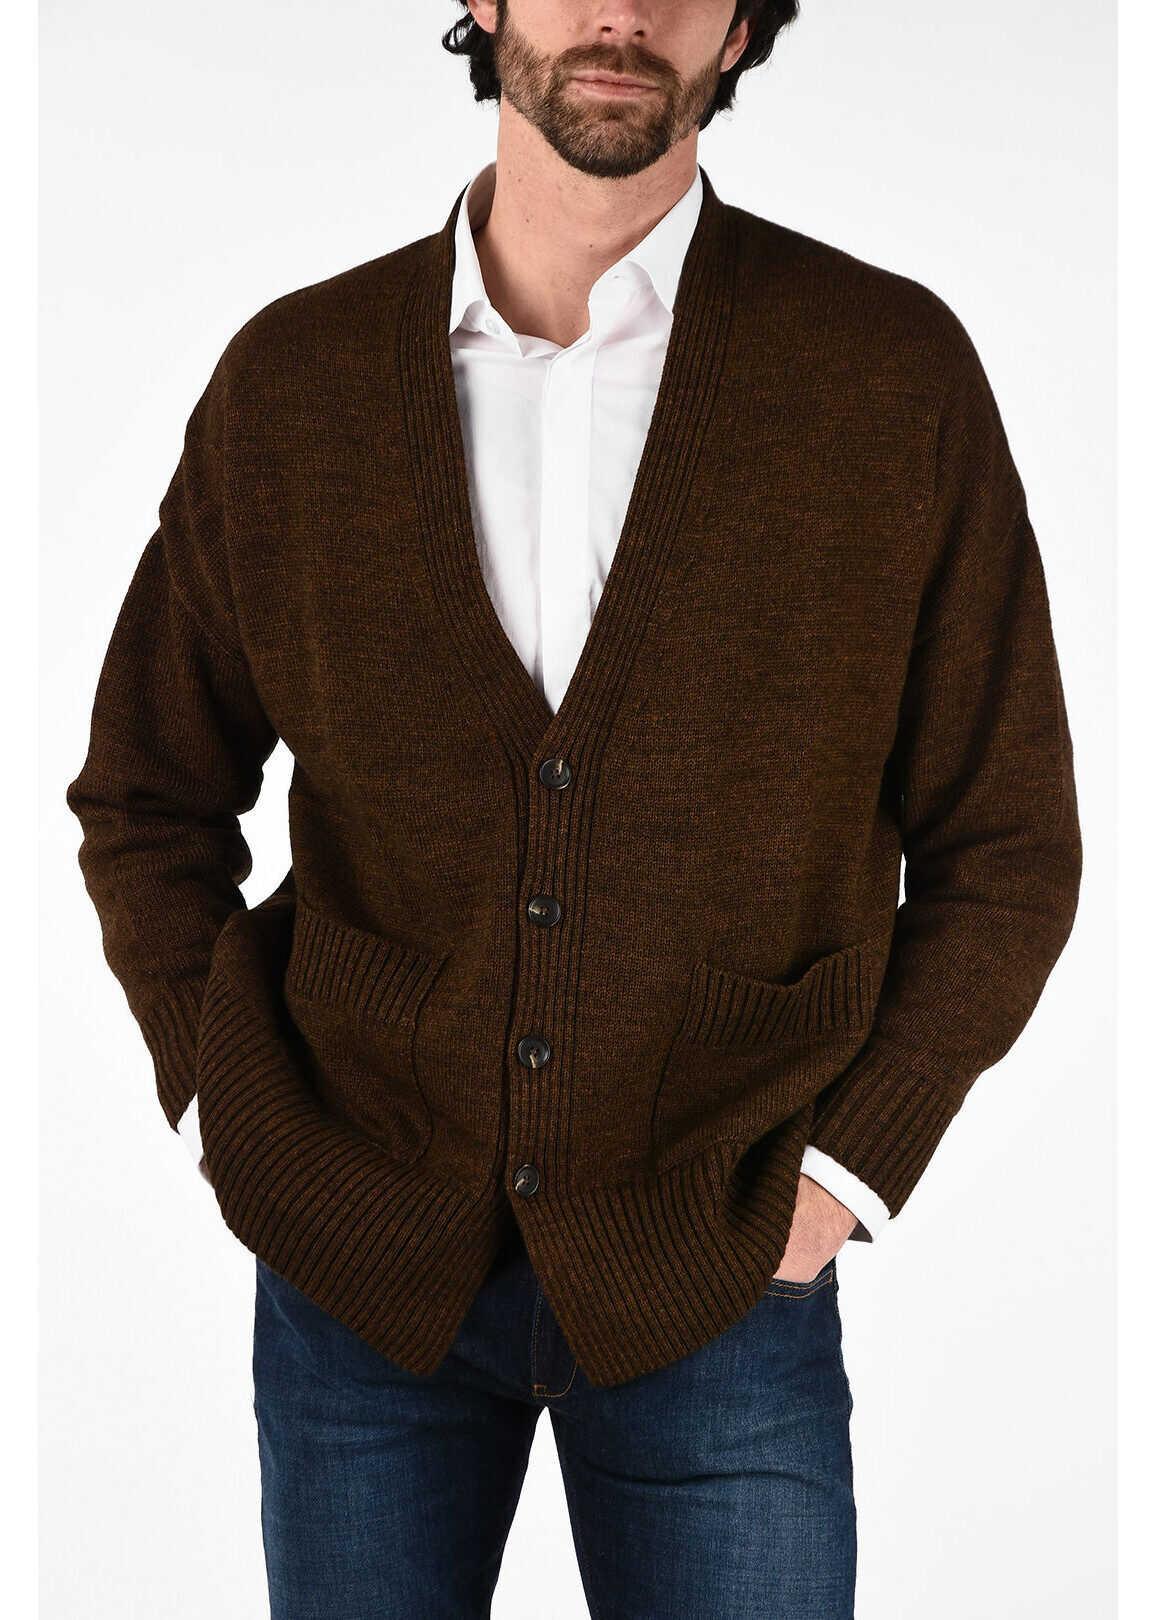 CORNELIANI CC COLLECTION v-neck cable knit Cardigan BROWN imagine